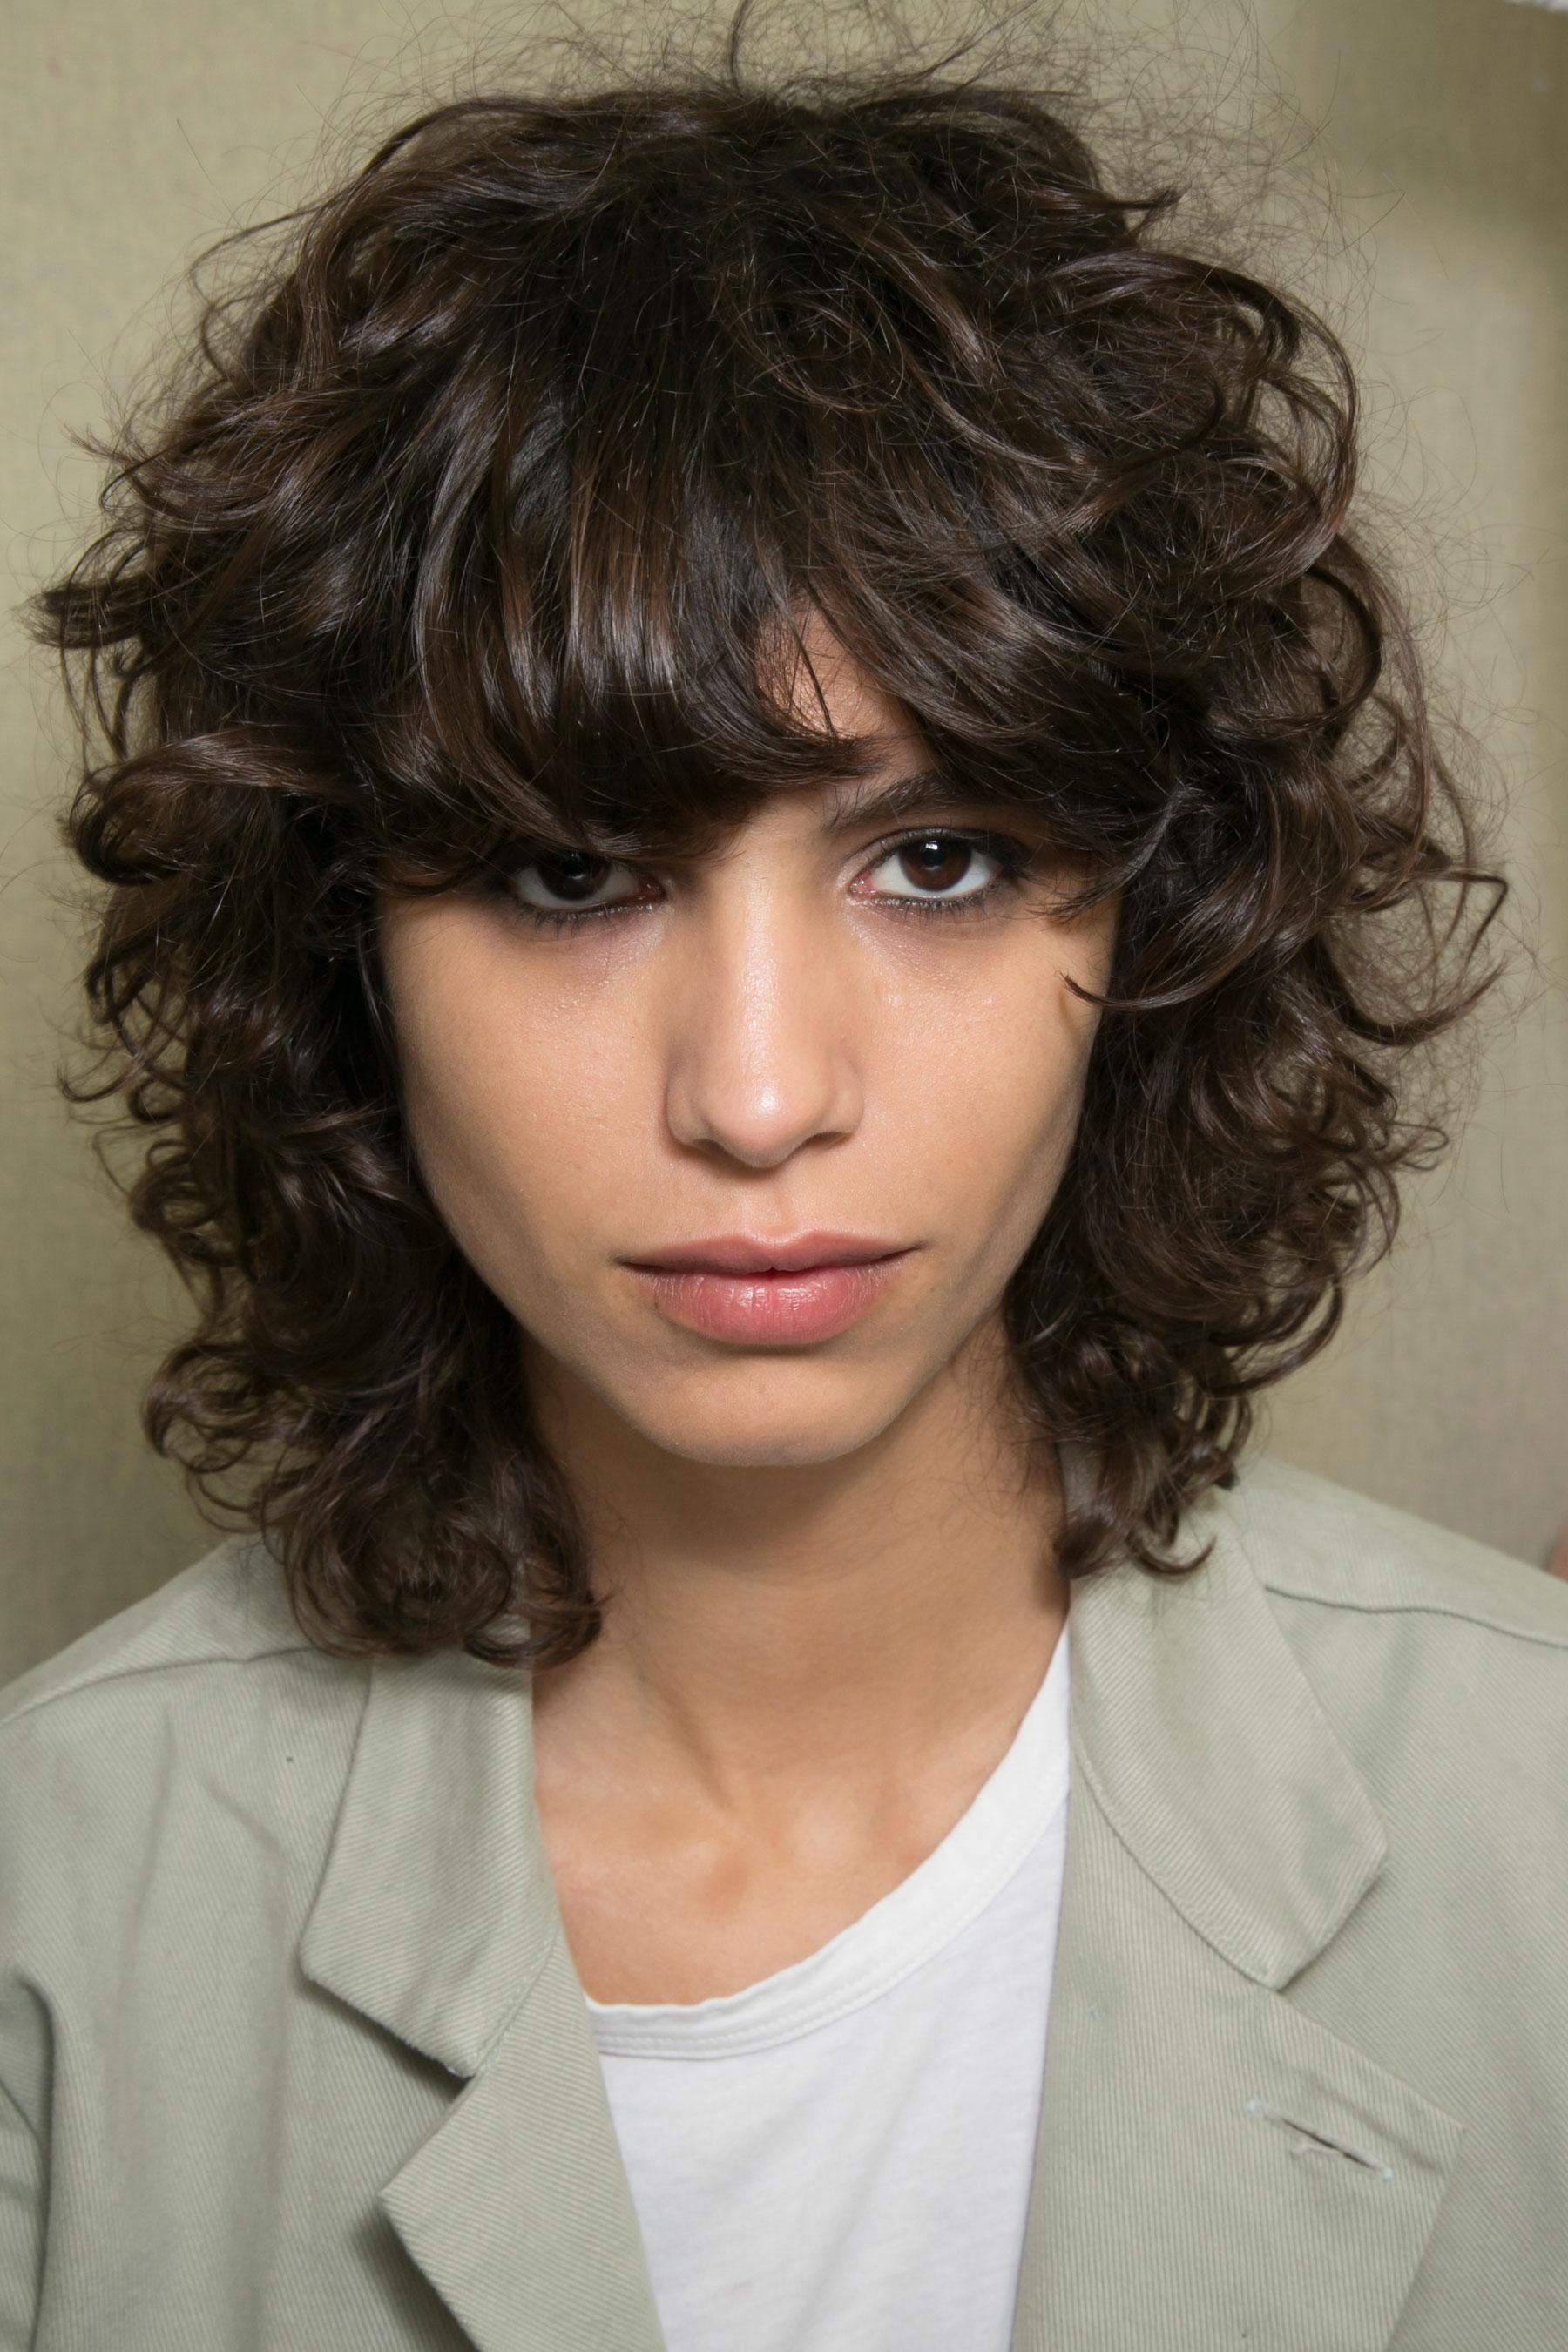 Chloe-spring-2016-beauty-fashion-show-the-impression-001